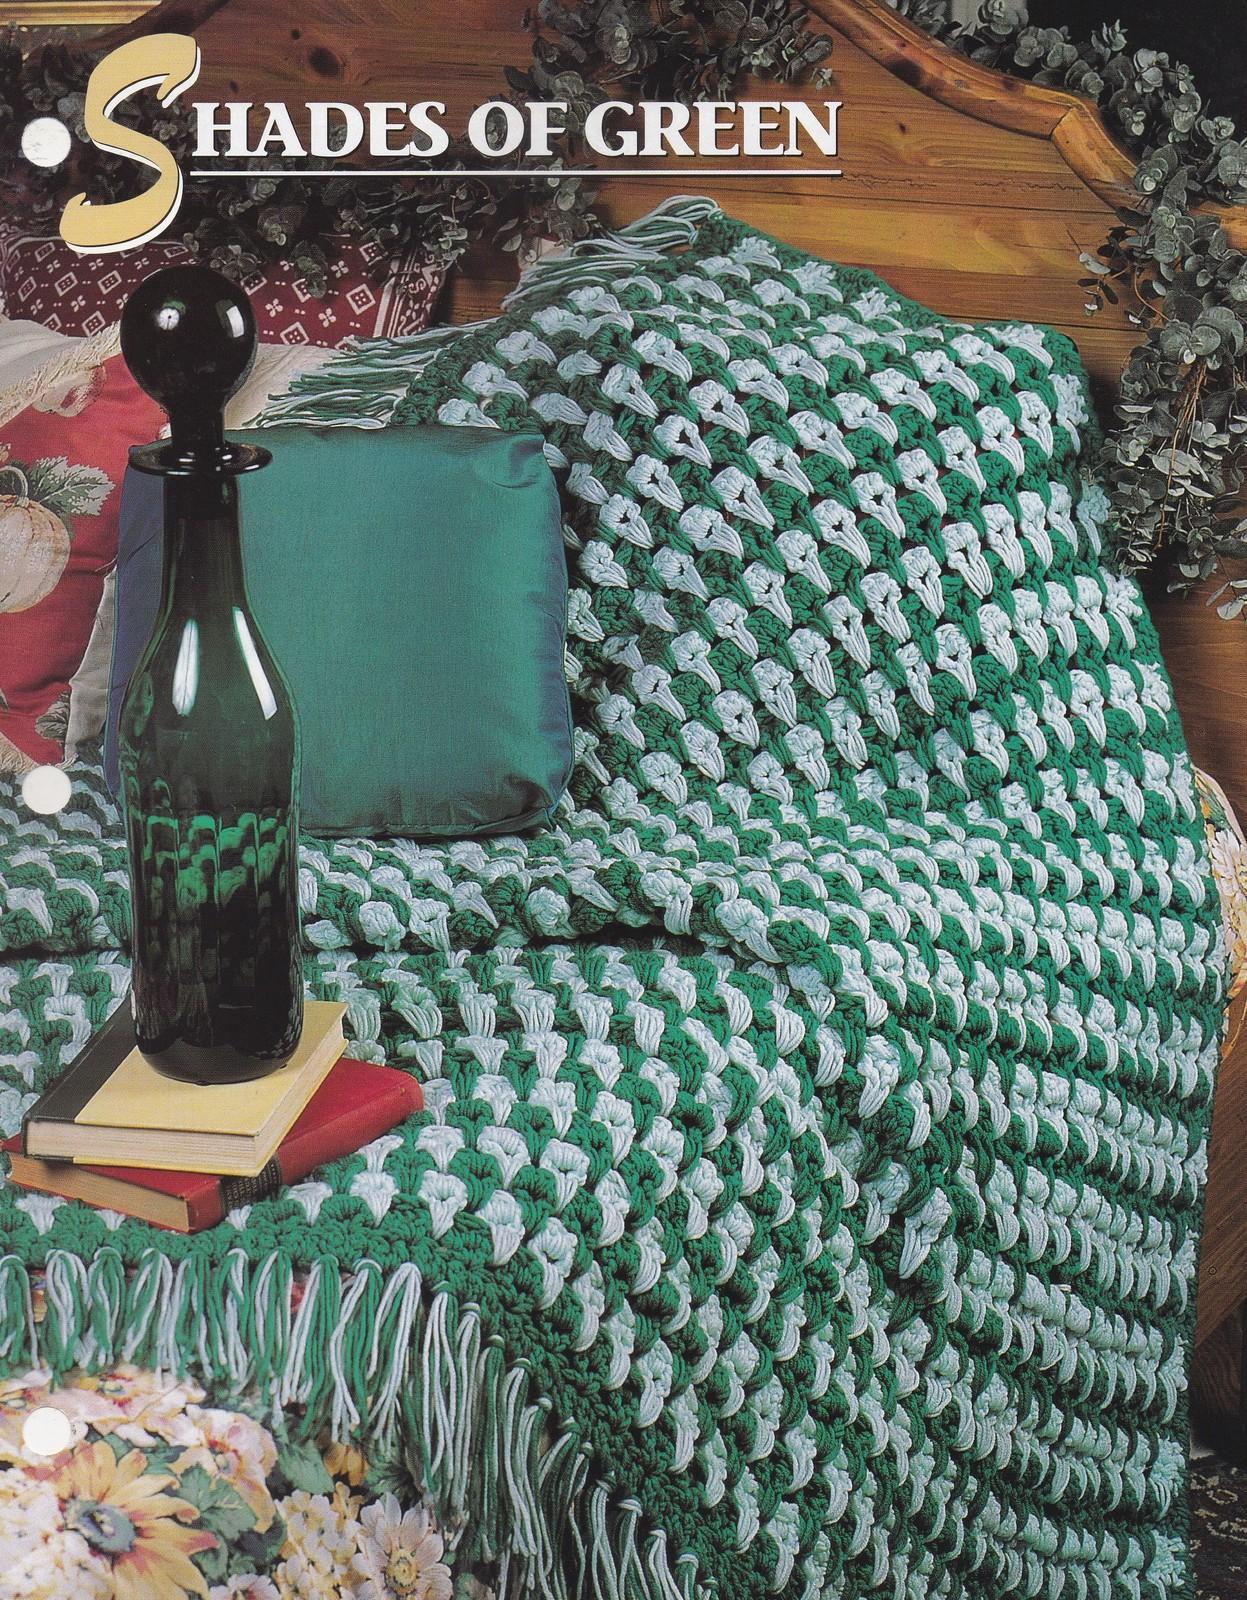 Shades of Green, Annie's Attic Crochet Quilt & Afghan Pattern Leaflet QAC310-04